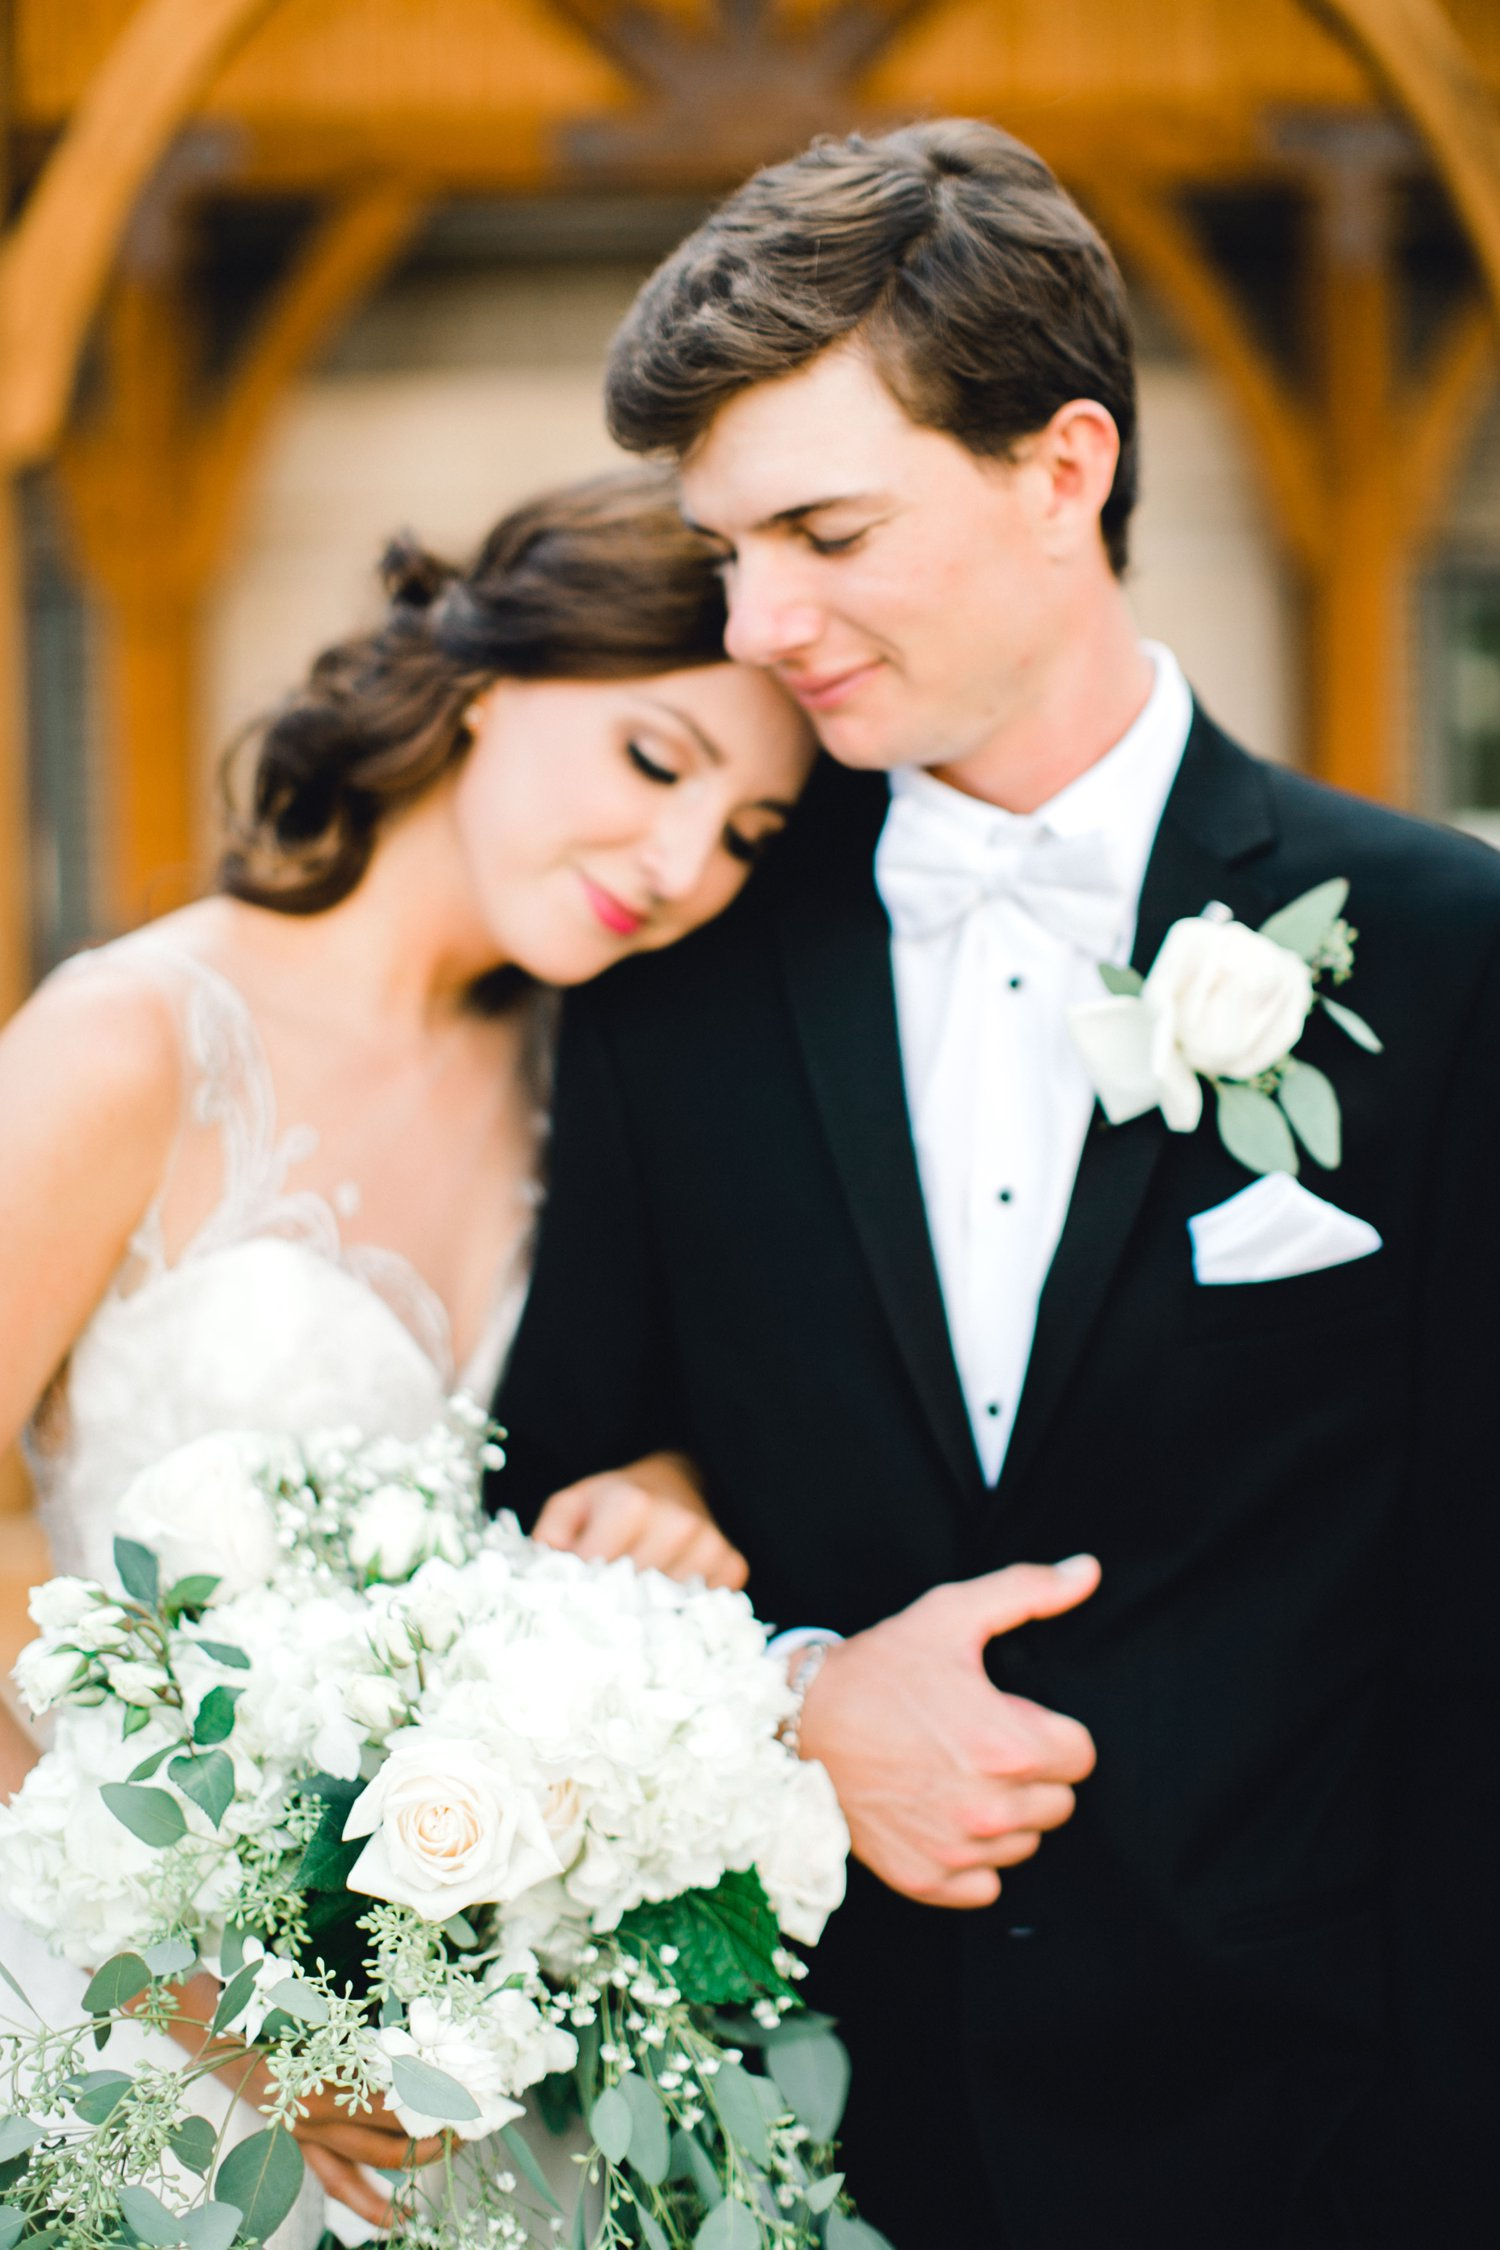 Hunter_and_Molly_Rawls_ALLEEJ_Lubbock_WEDDING_Legacy_Event_Center_0121.jpg